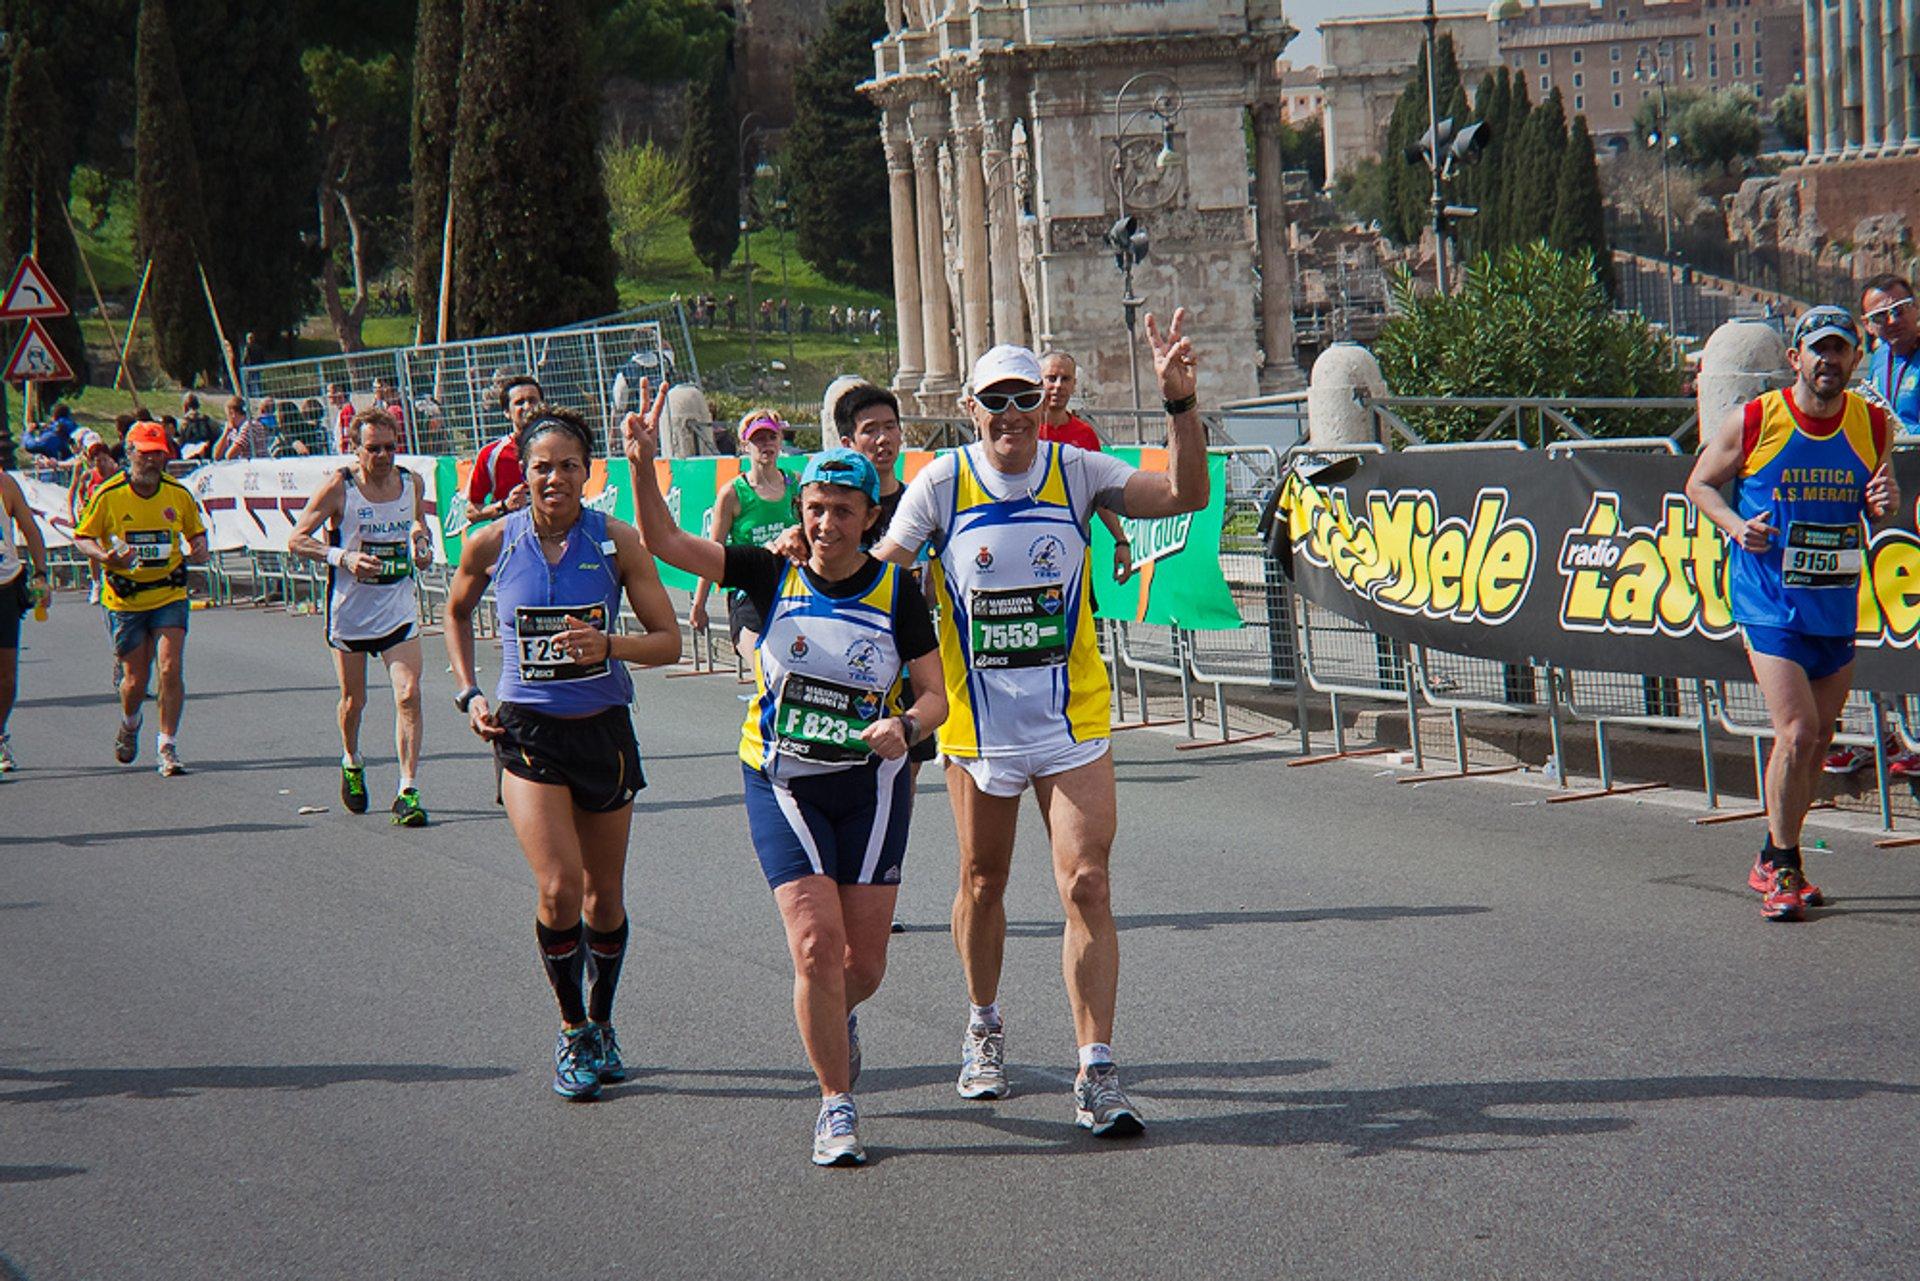 Maratona di Roma (Rome Marathon) in Rome - Best Season 2019